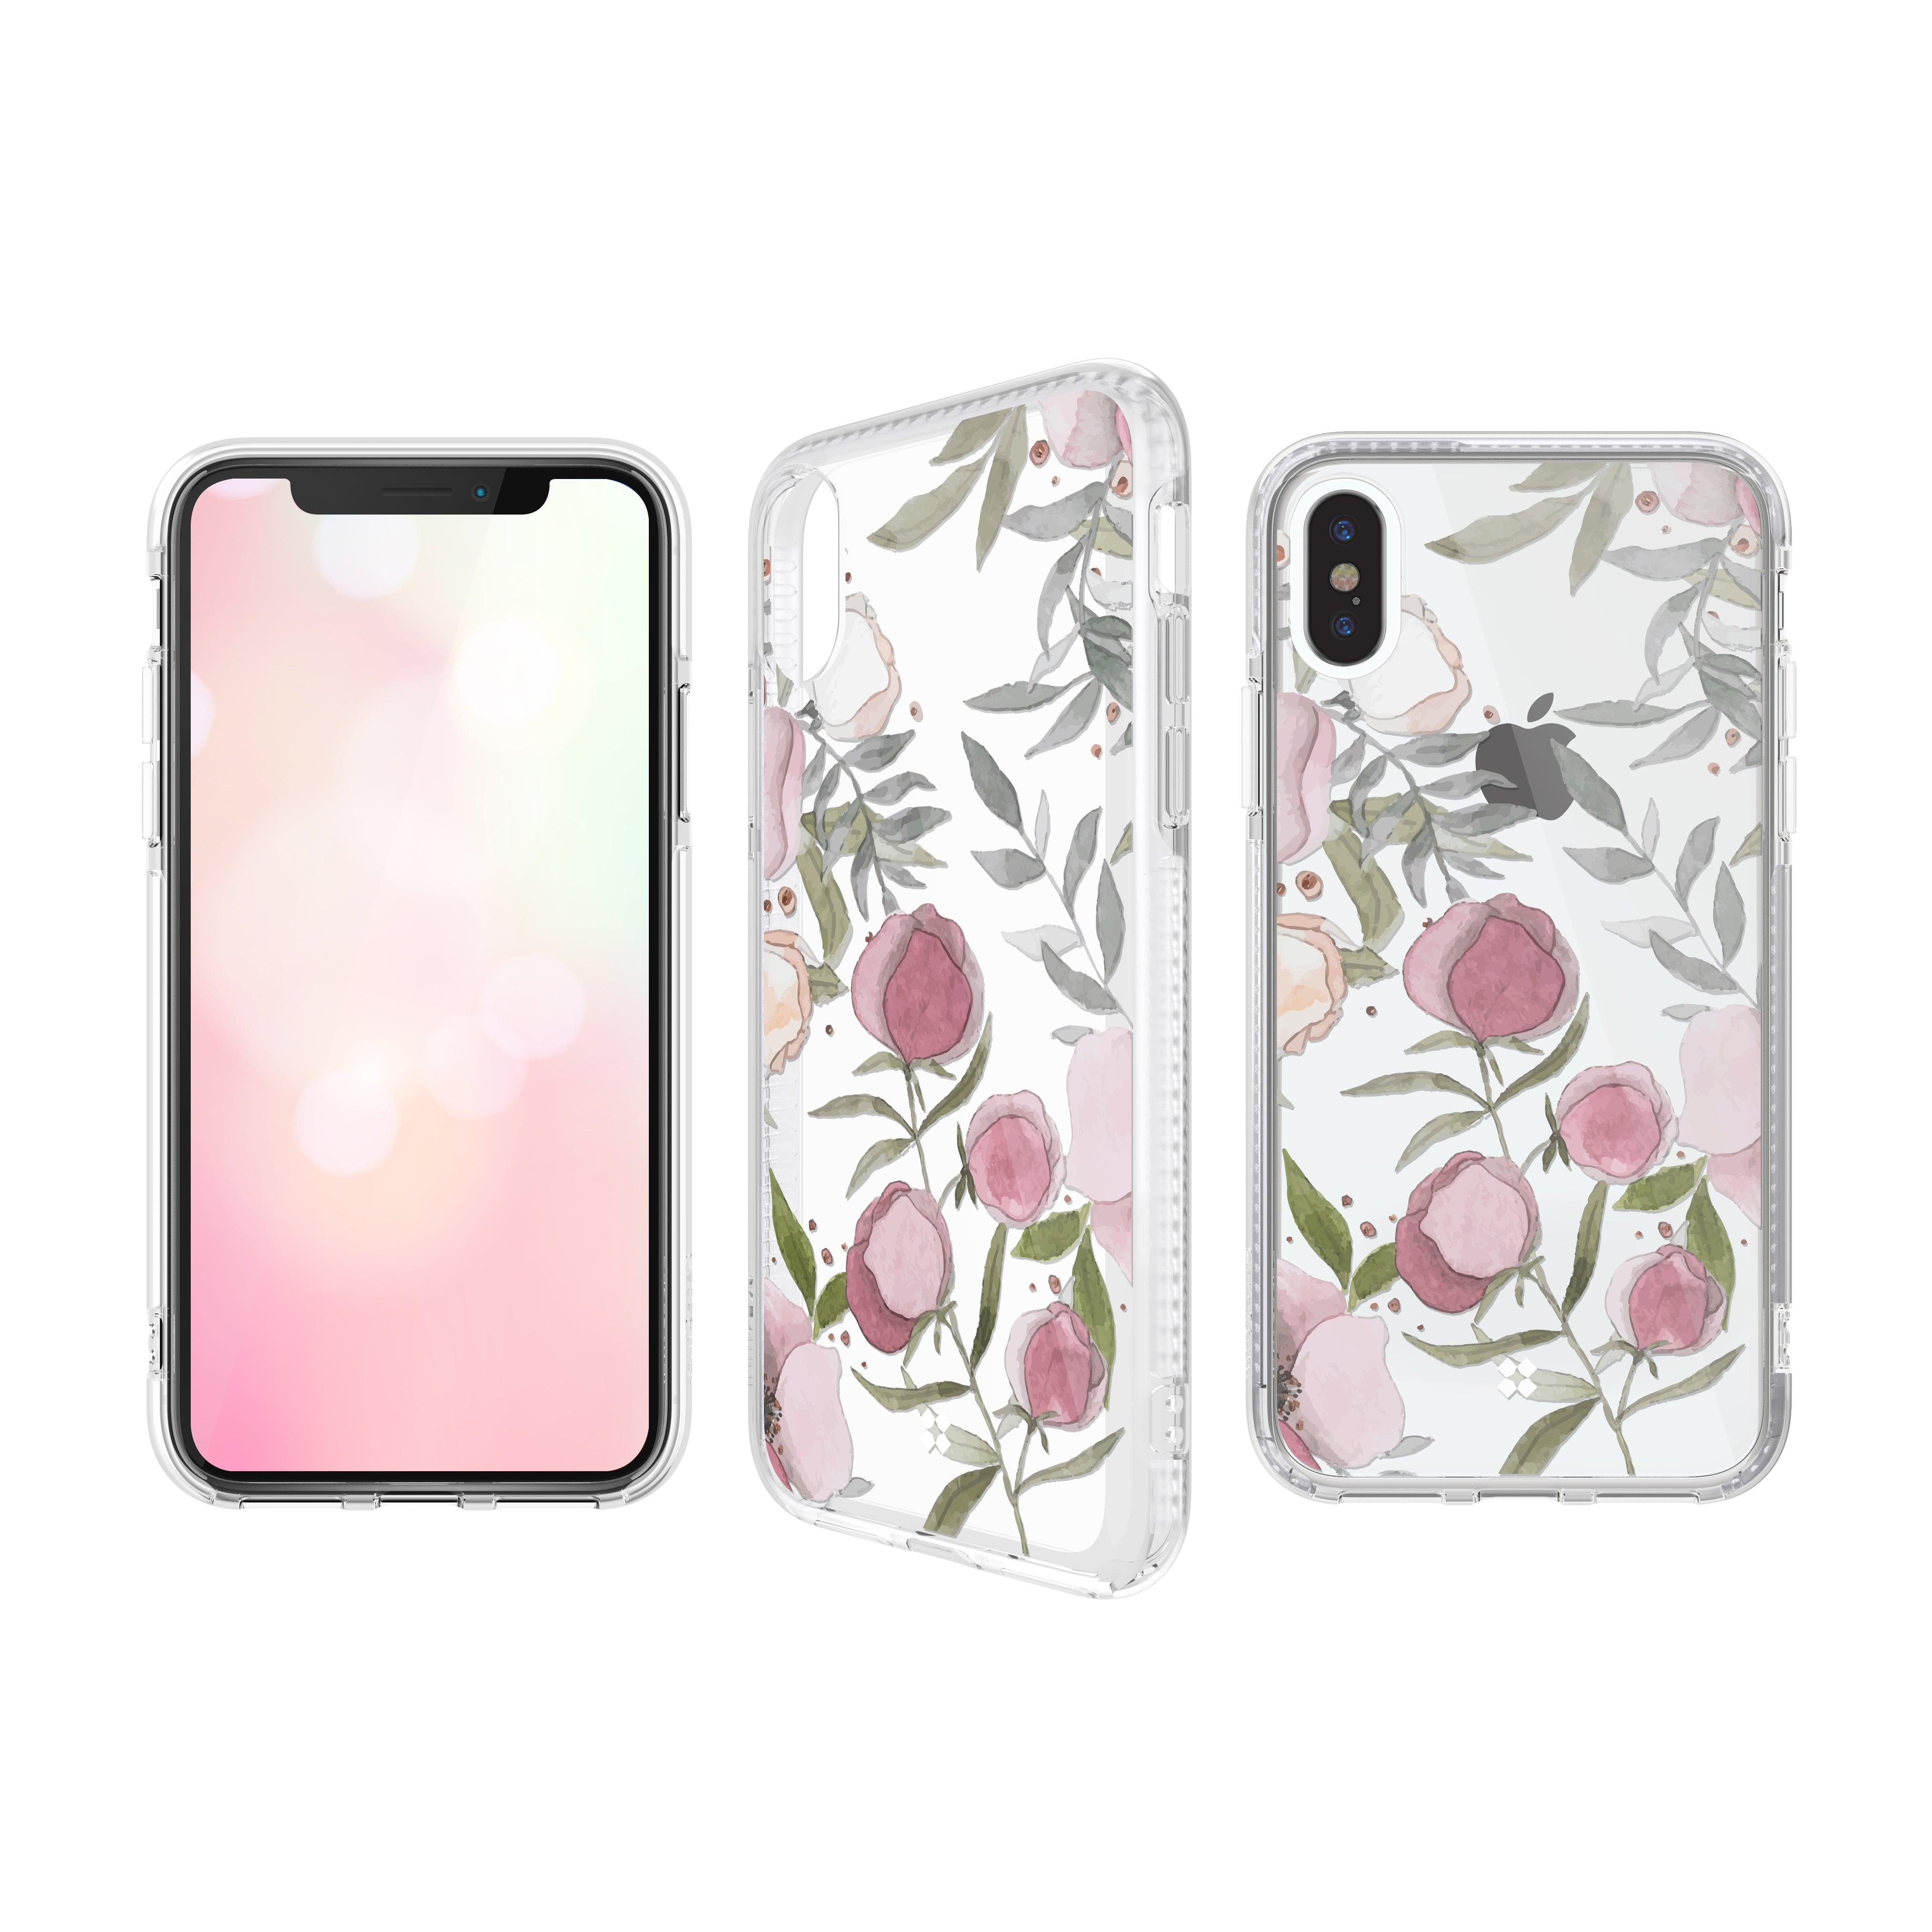 CaseStudi ケーススタディ iPhone Xs / X / XR / Xs Max  PRISMART Case 2018 ローズ 花 Rose 耐衝撃 ケース 国内正規品